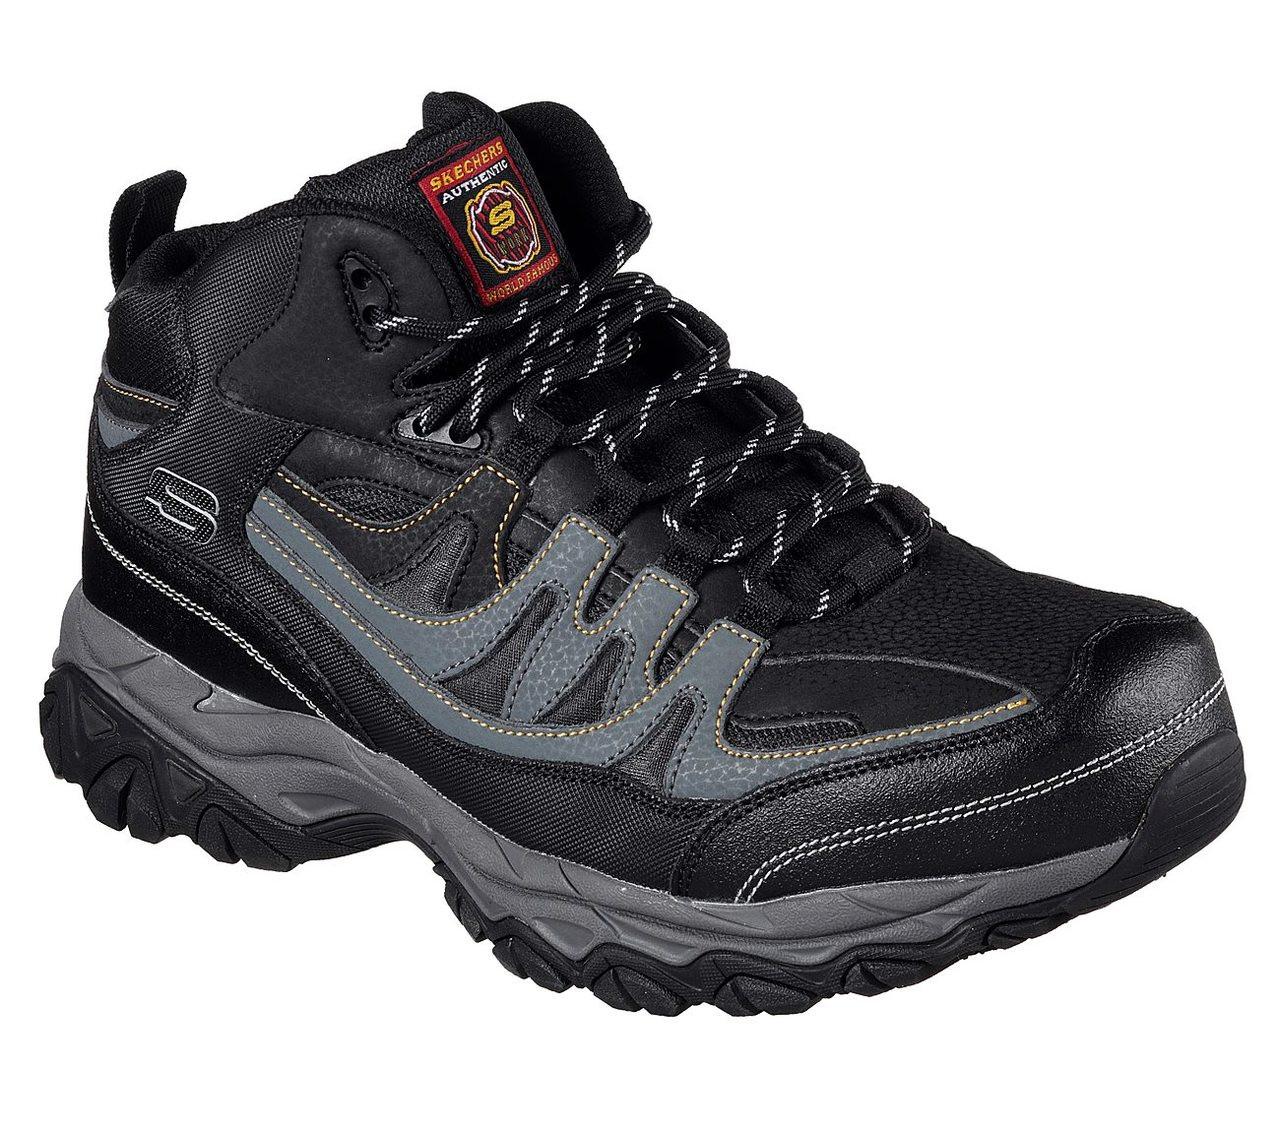 775f2dd40fdbf ... Boots; Skechers Men's Holdredge Mid Steel Toe - Black. Image 1